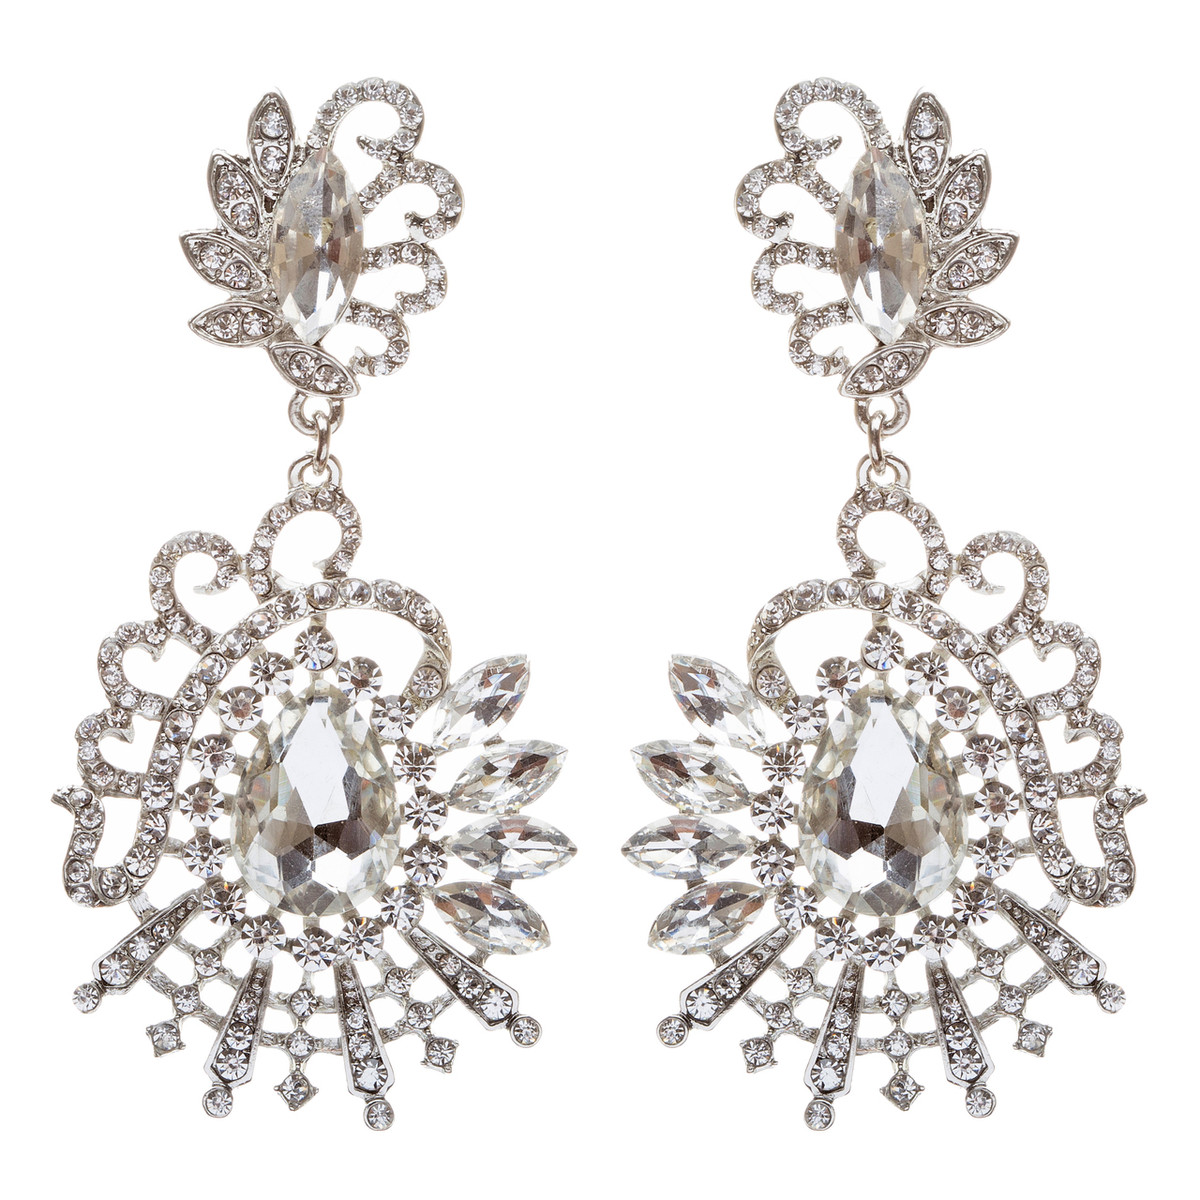 ACCESSORIESFOREVER Bridal Wedding Jewelry Crystal Rhinestone